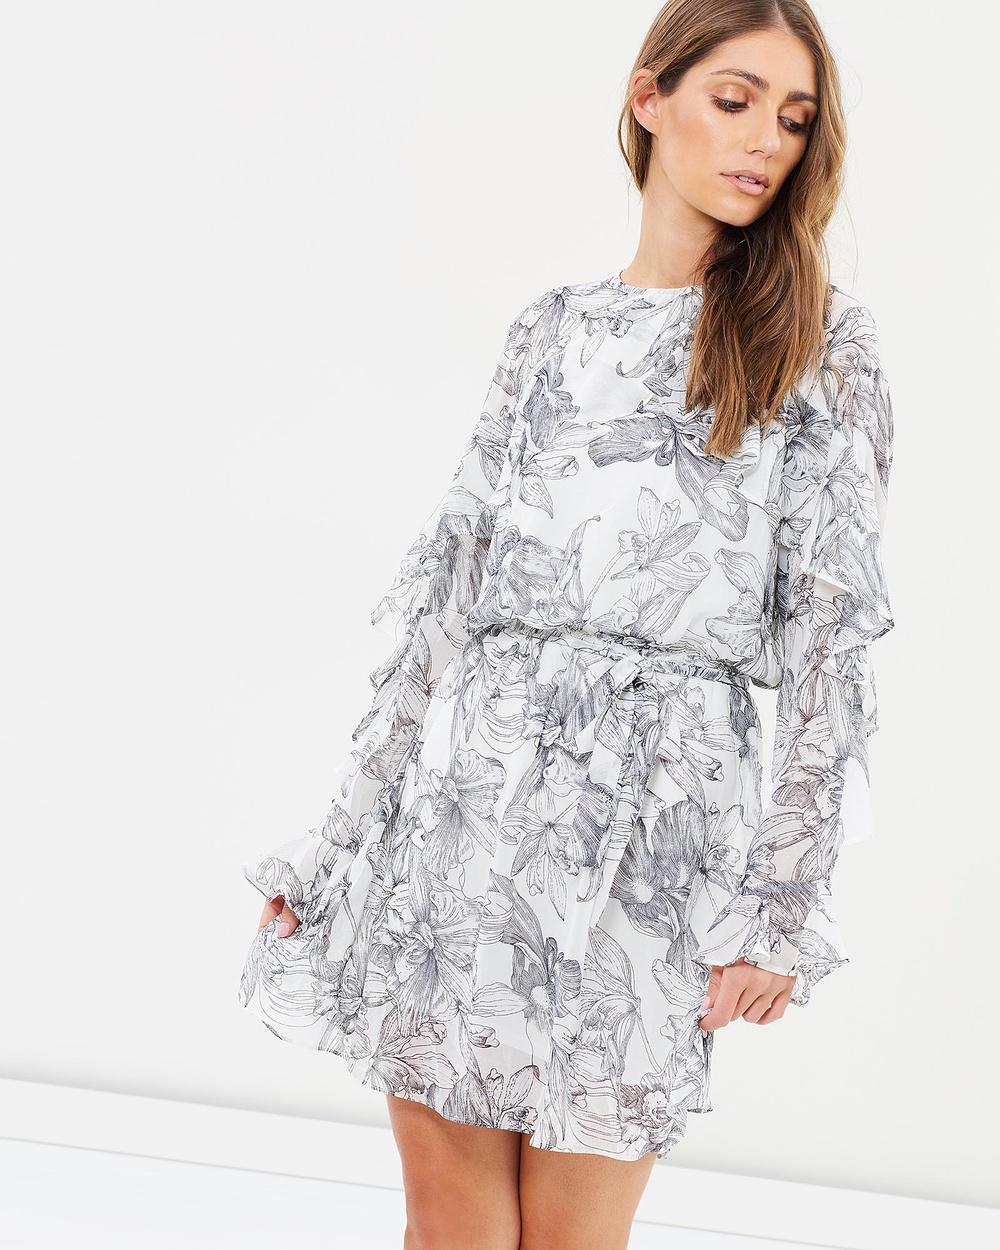 Fresh Soul Nevada Dress Printed Dresses White Floral Print Nevada Dress